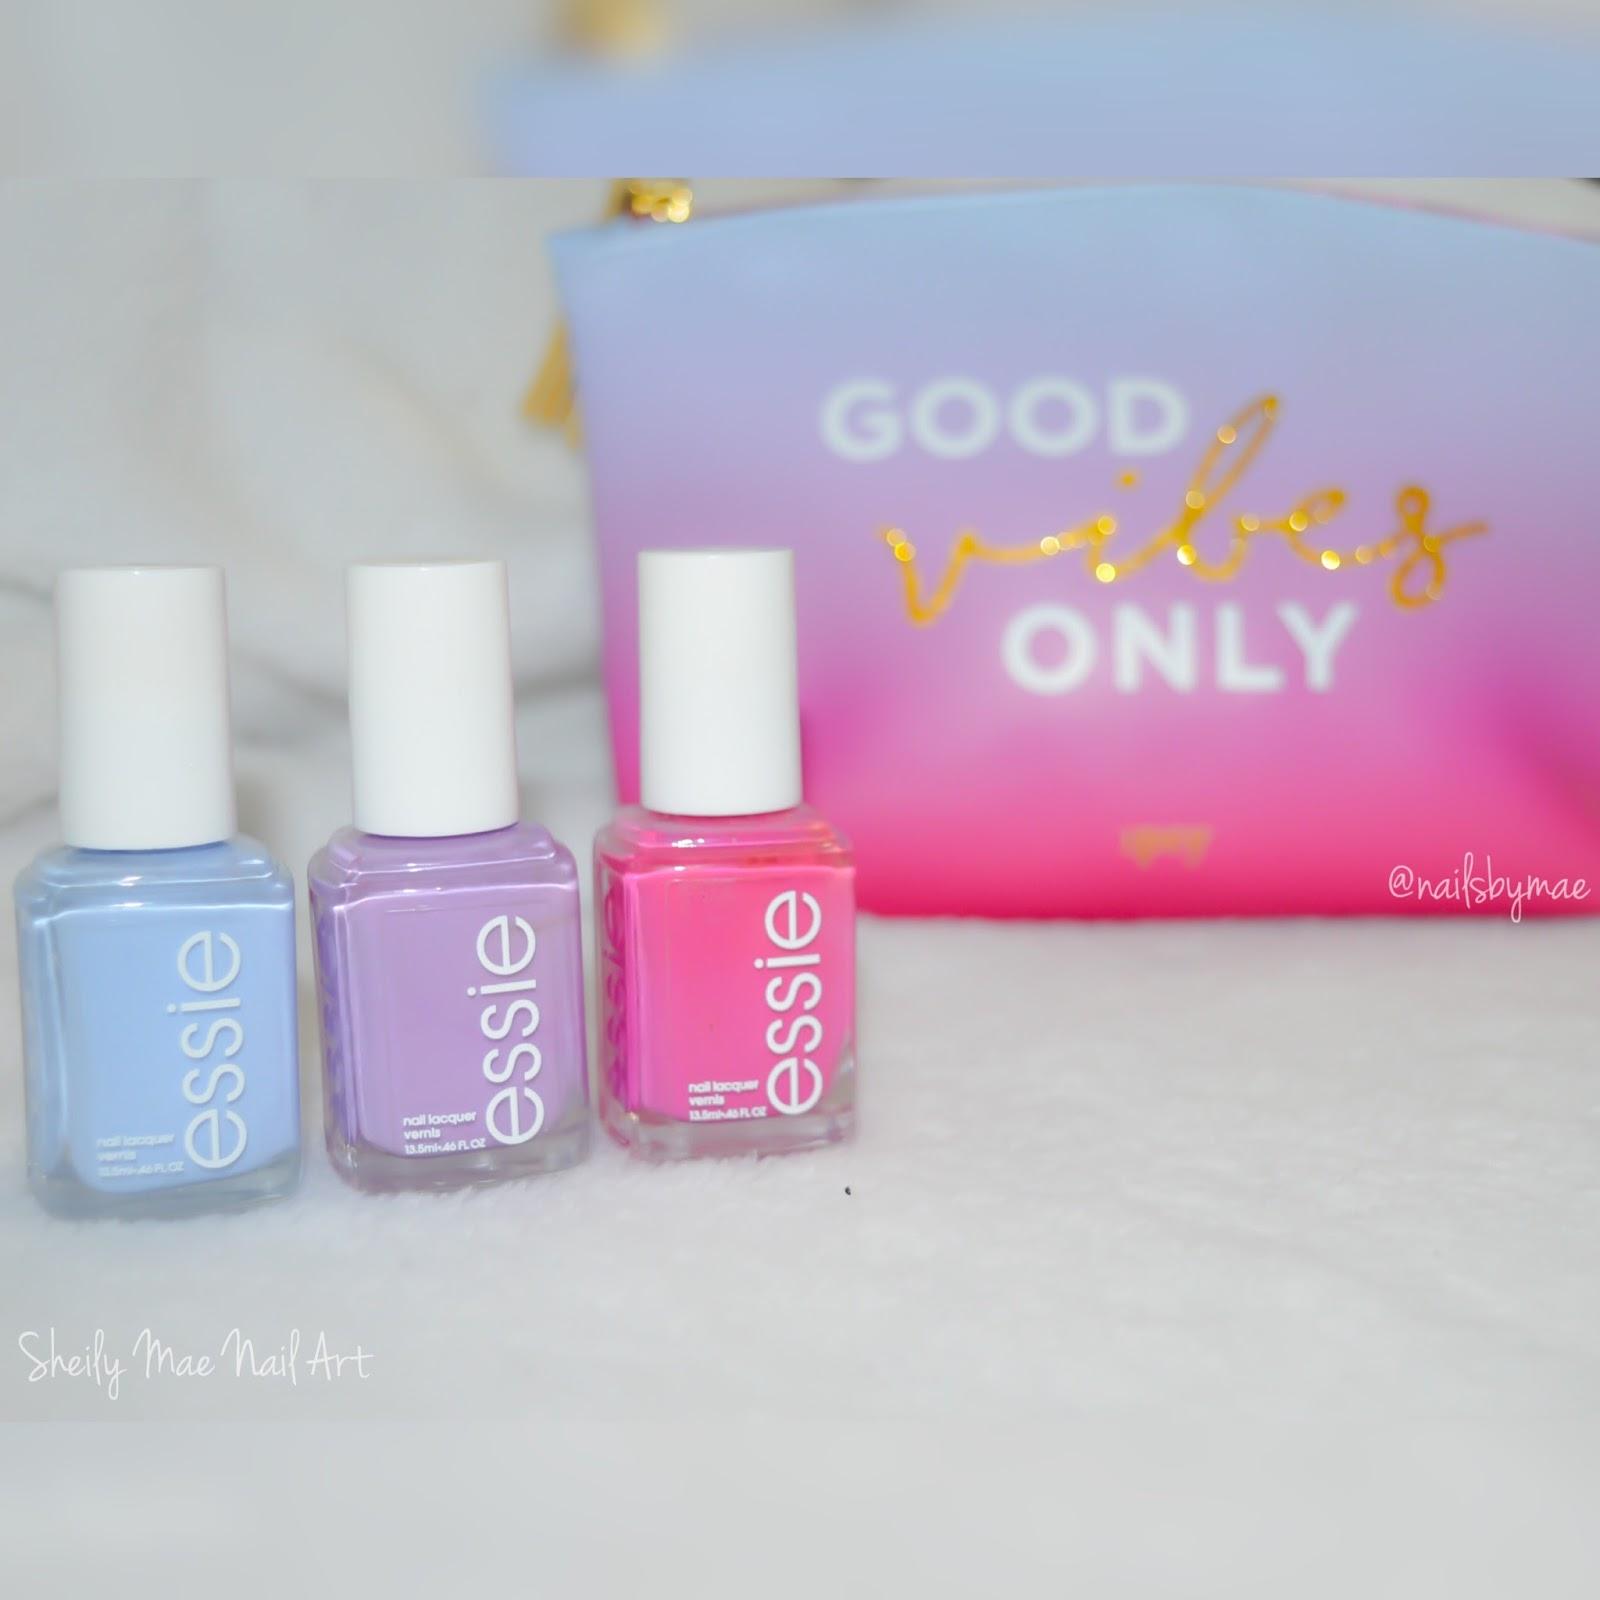 August Ipsy Glam Bag! - Nail Art Inspiration! - Sheily Mae Nail Art